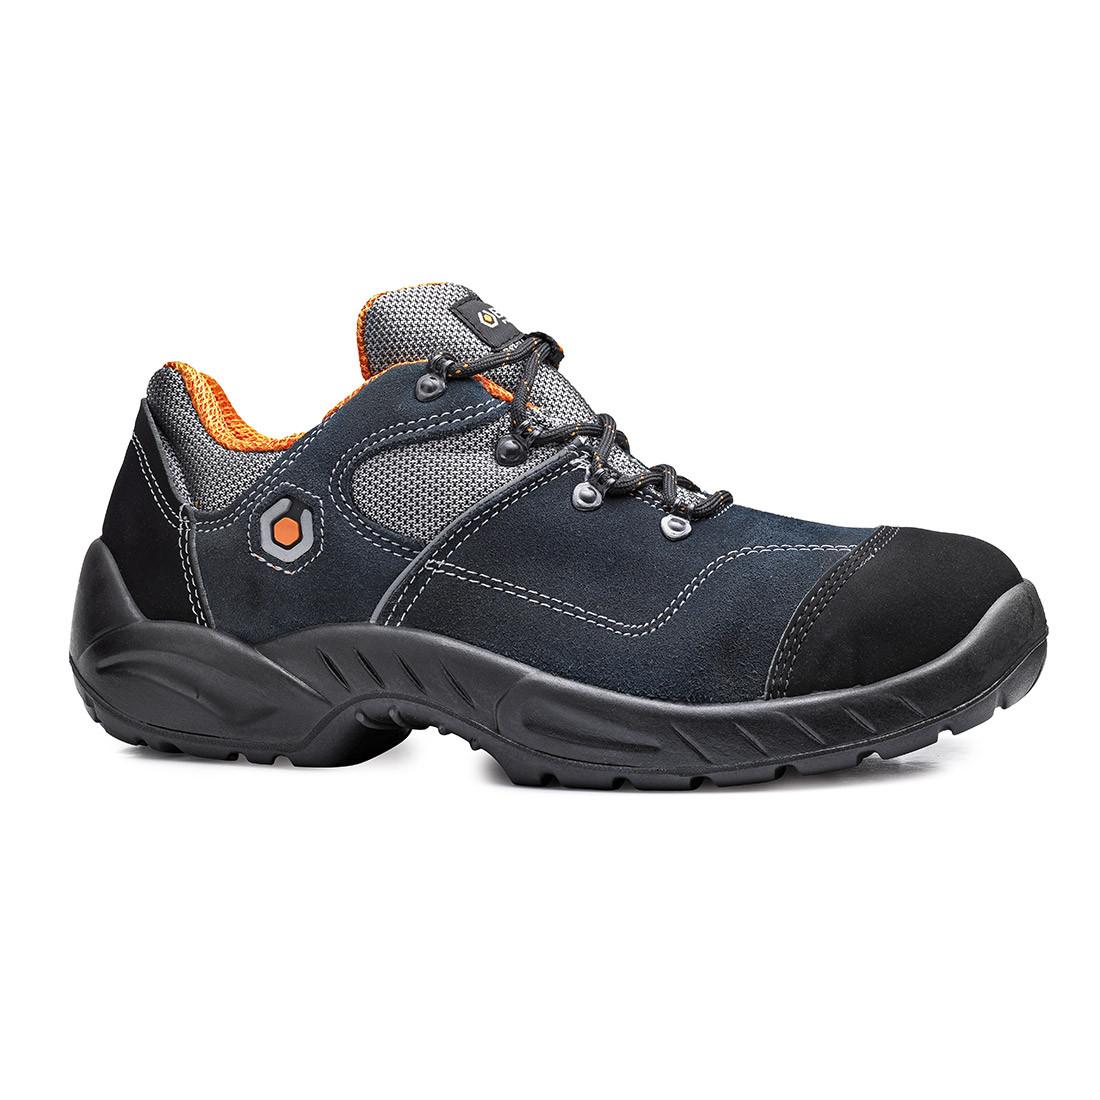 Pantofi Garribaldi S1P SRC - Incaltaminte de protectie